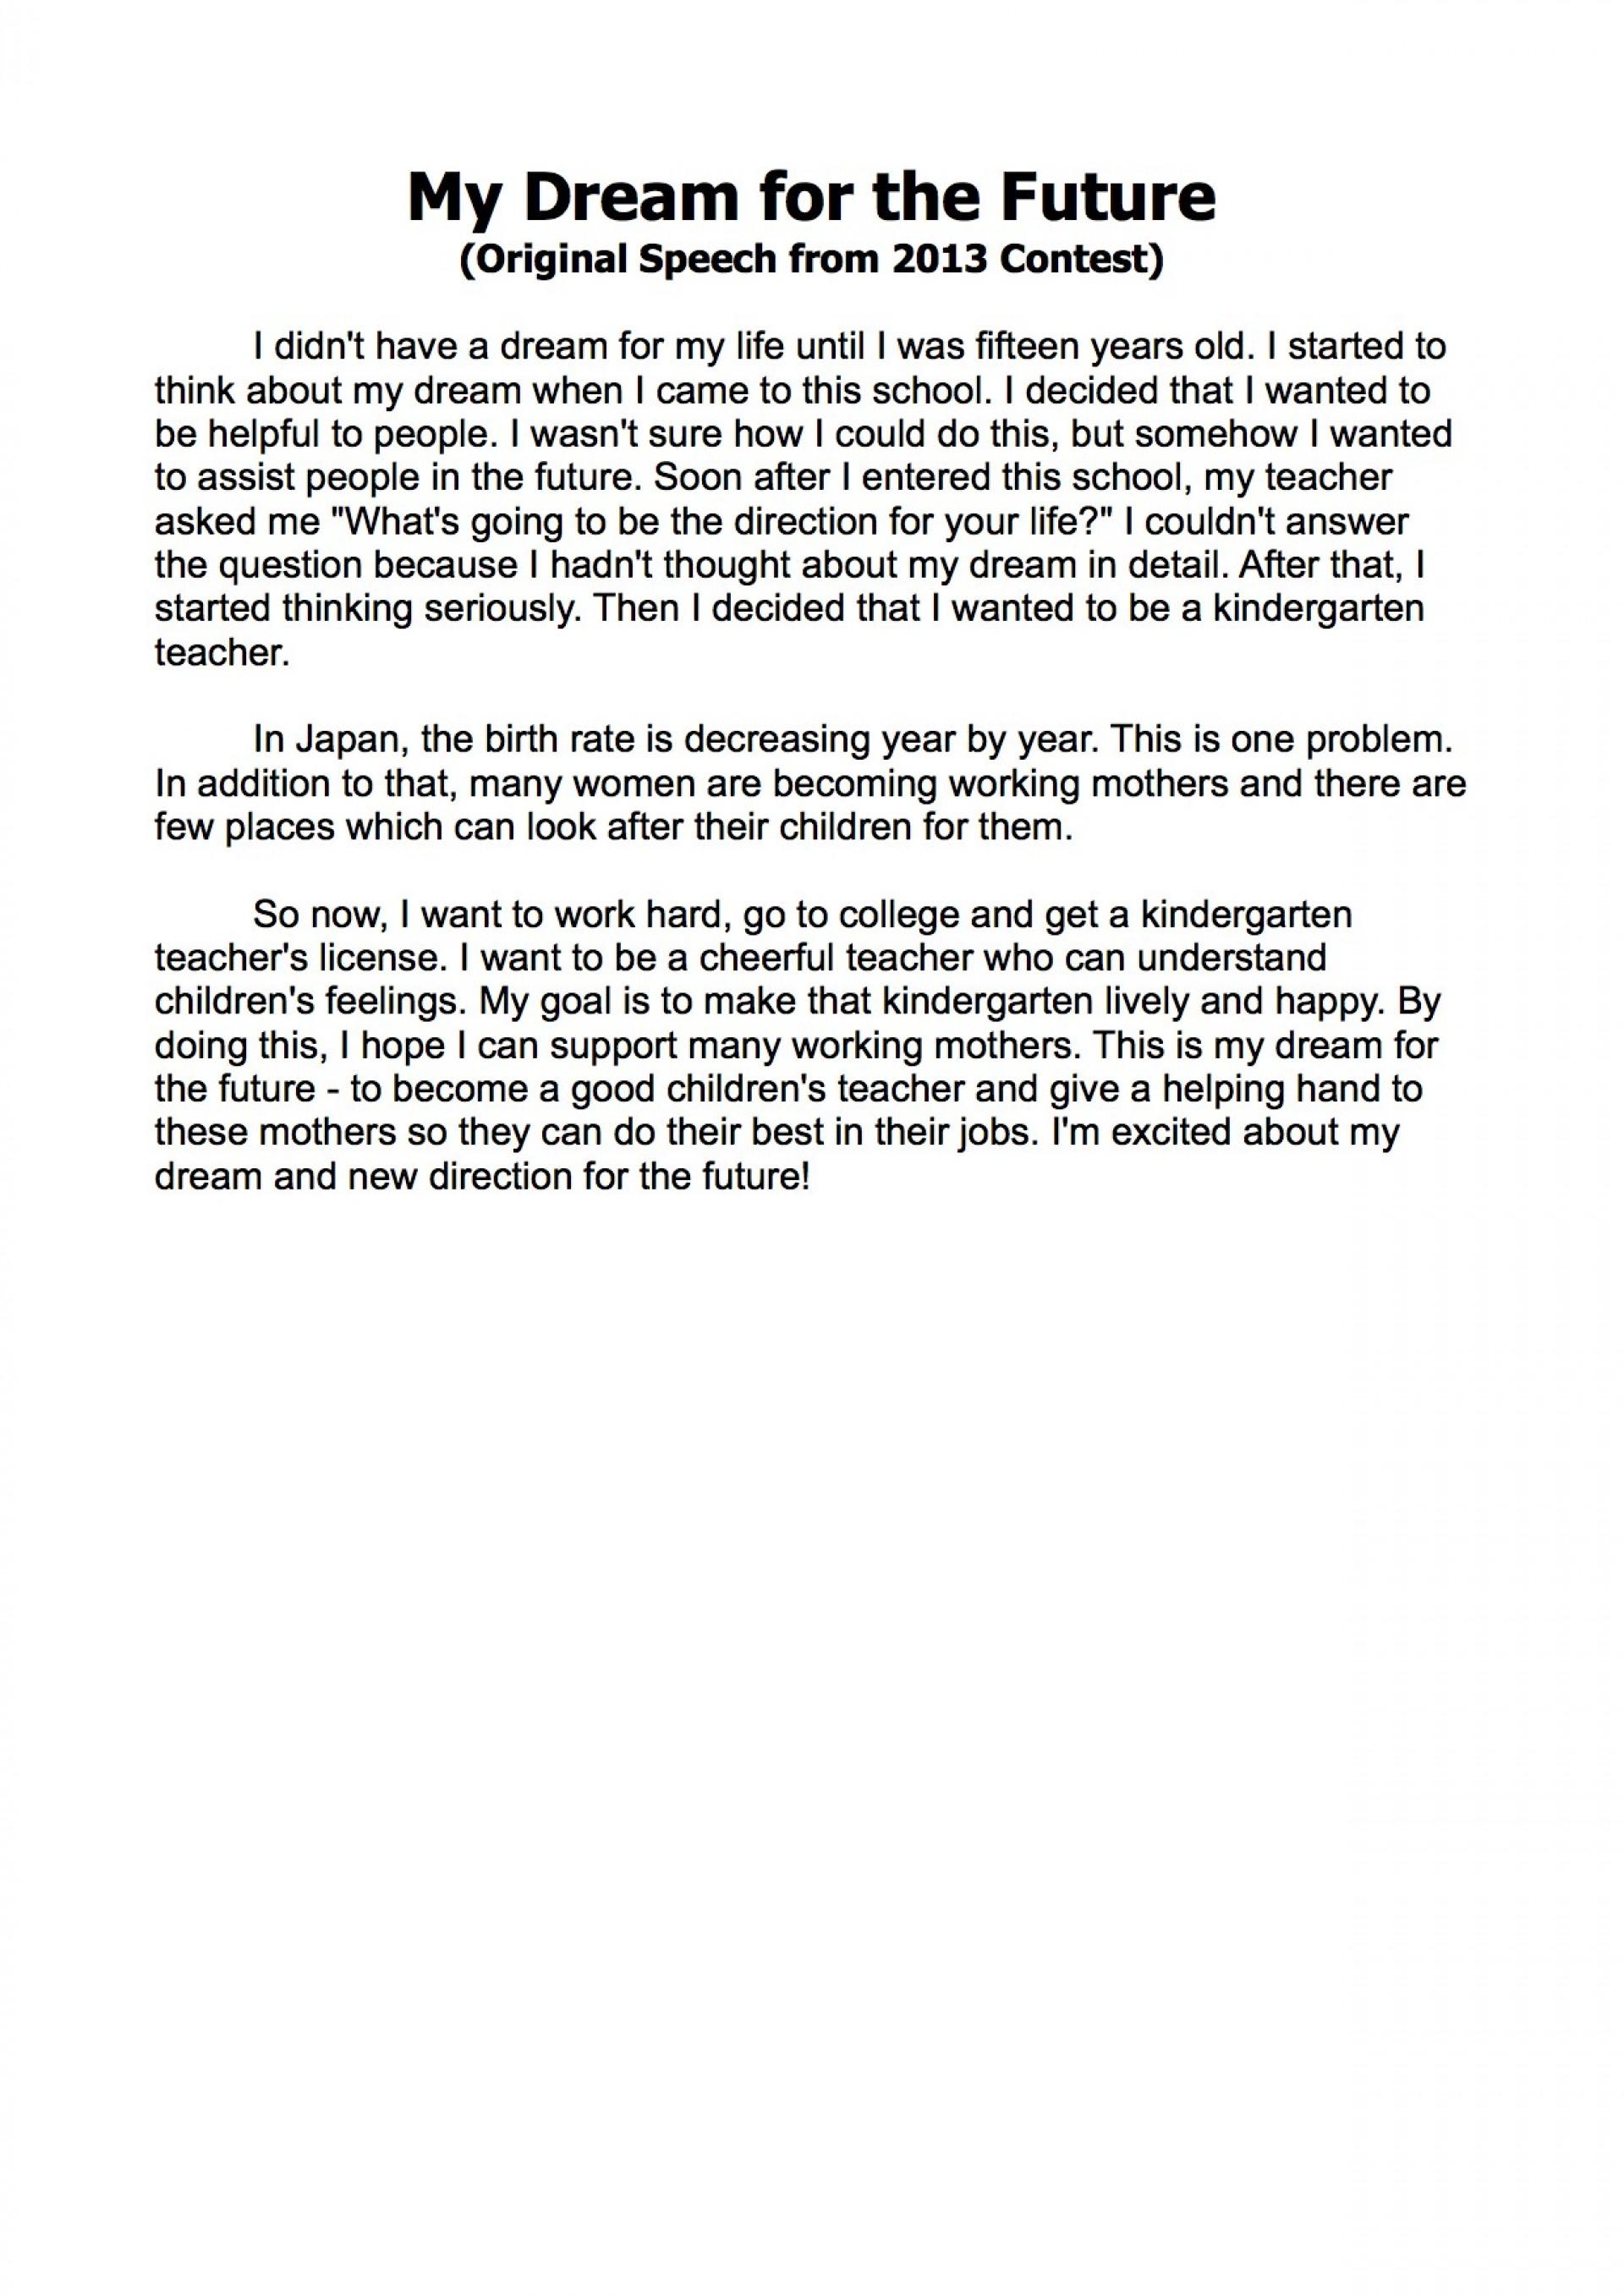 002 Dream Essay Unbelievable Lucid Conclusion College Examples Introduction 1920